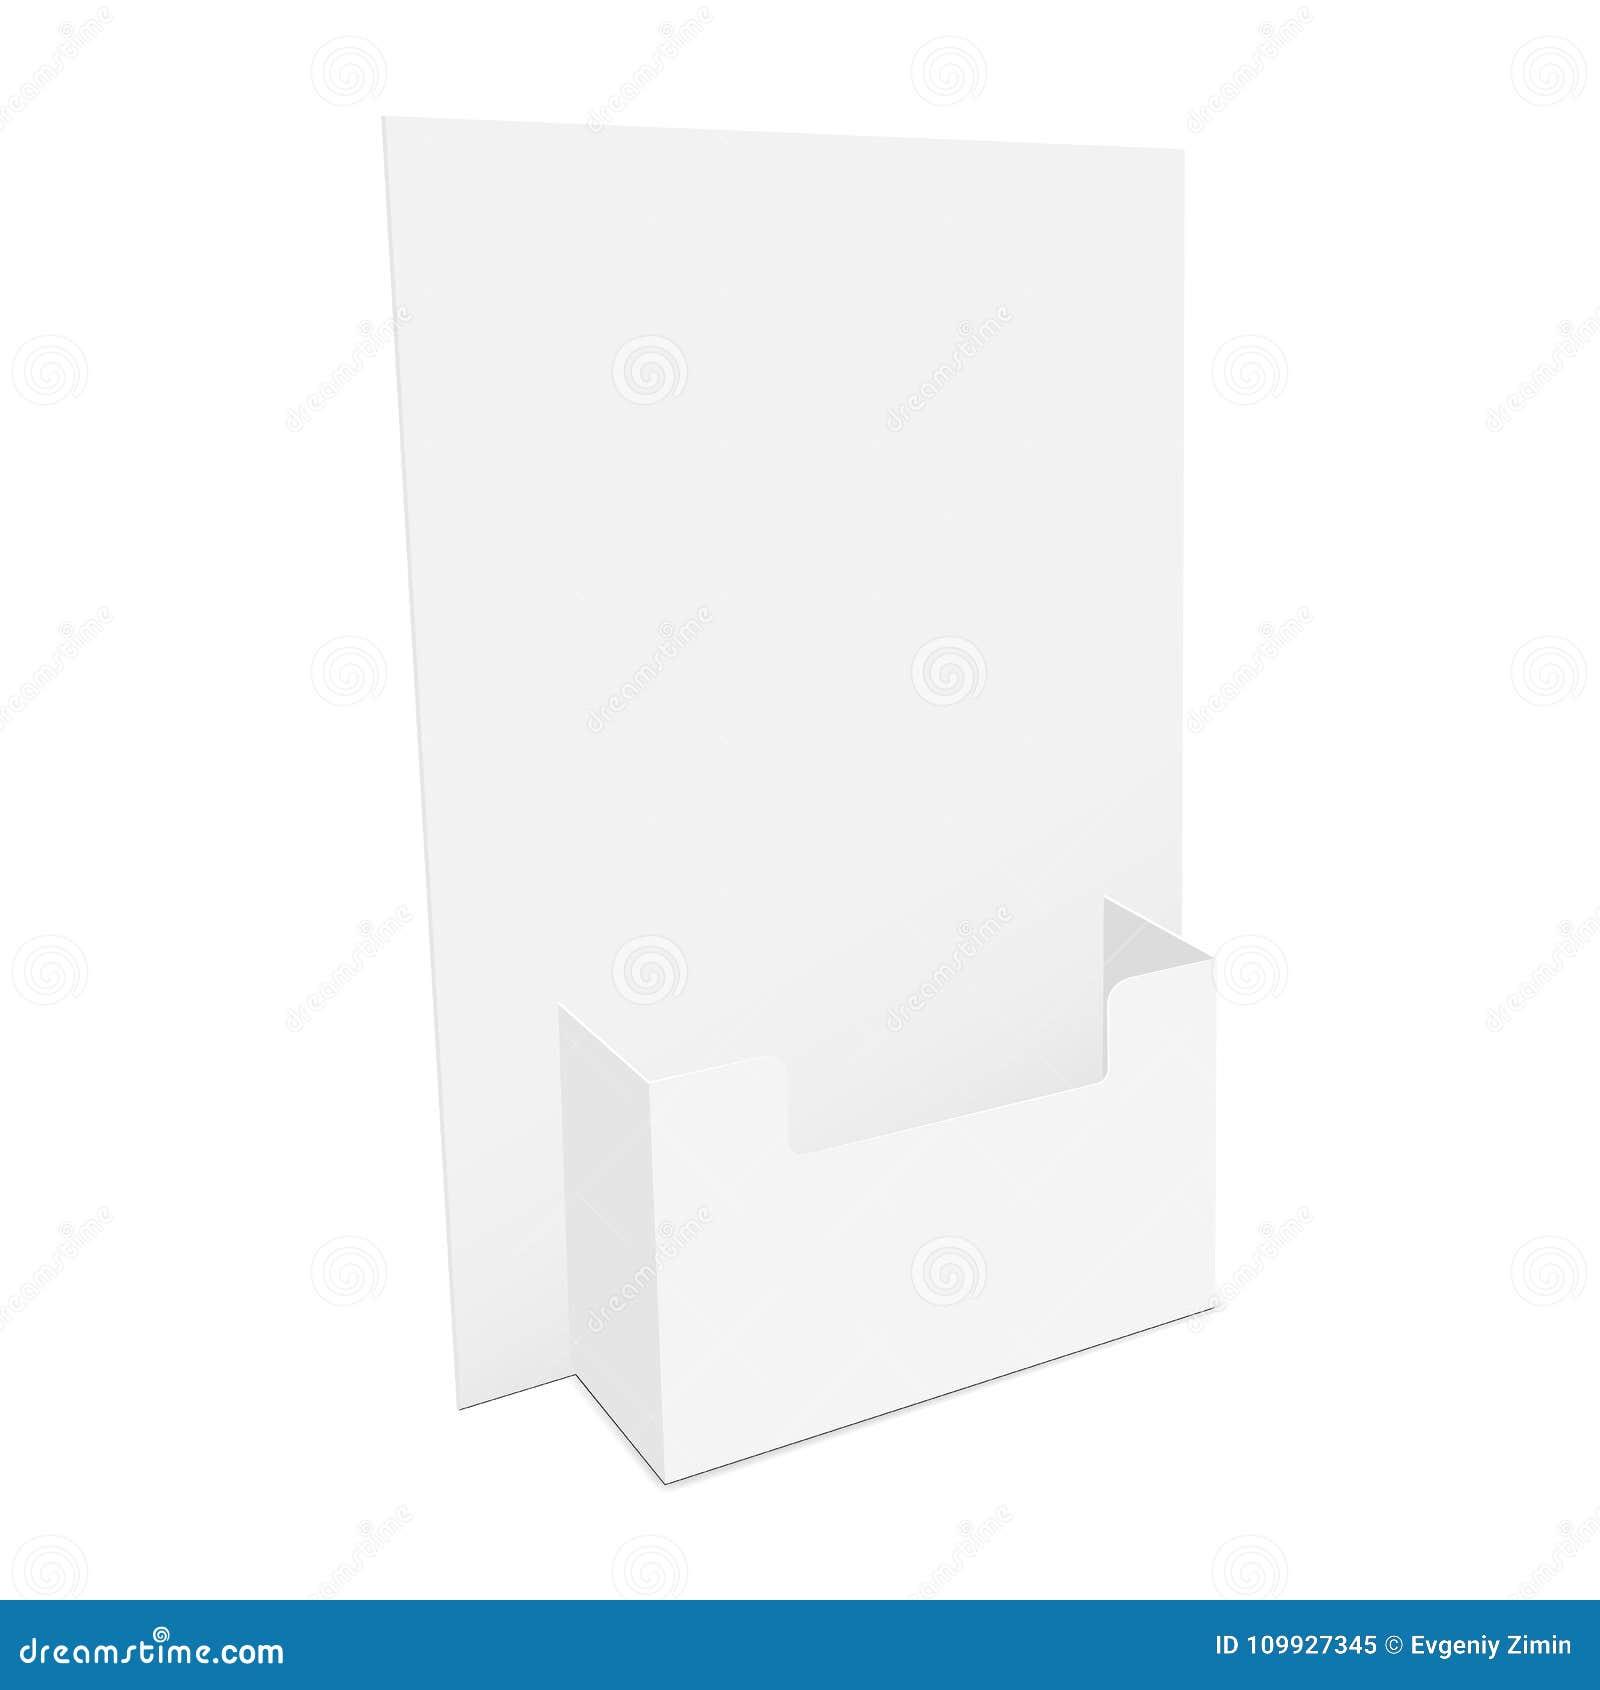 Cardboard flyer dispenser stock vector. Illustration of mockup ...